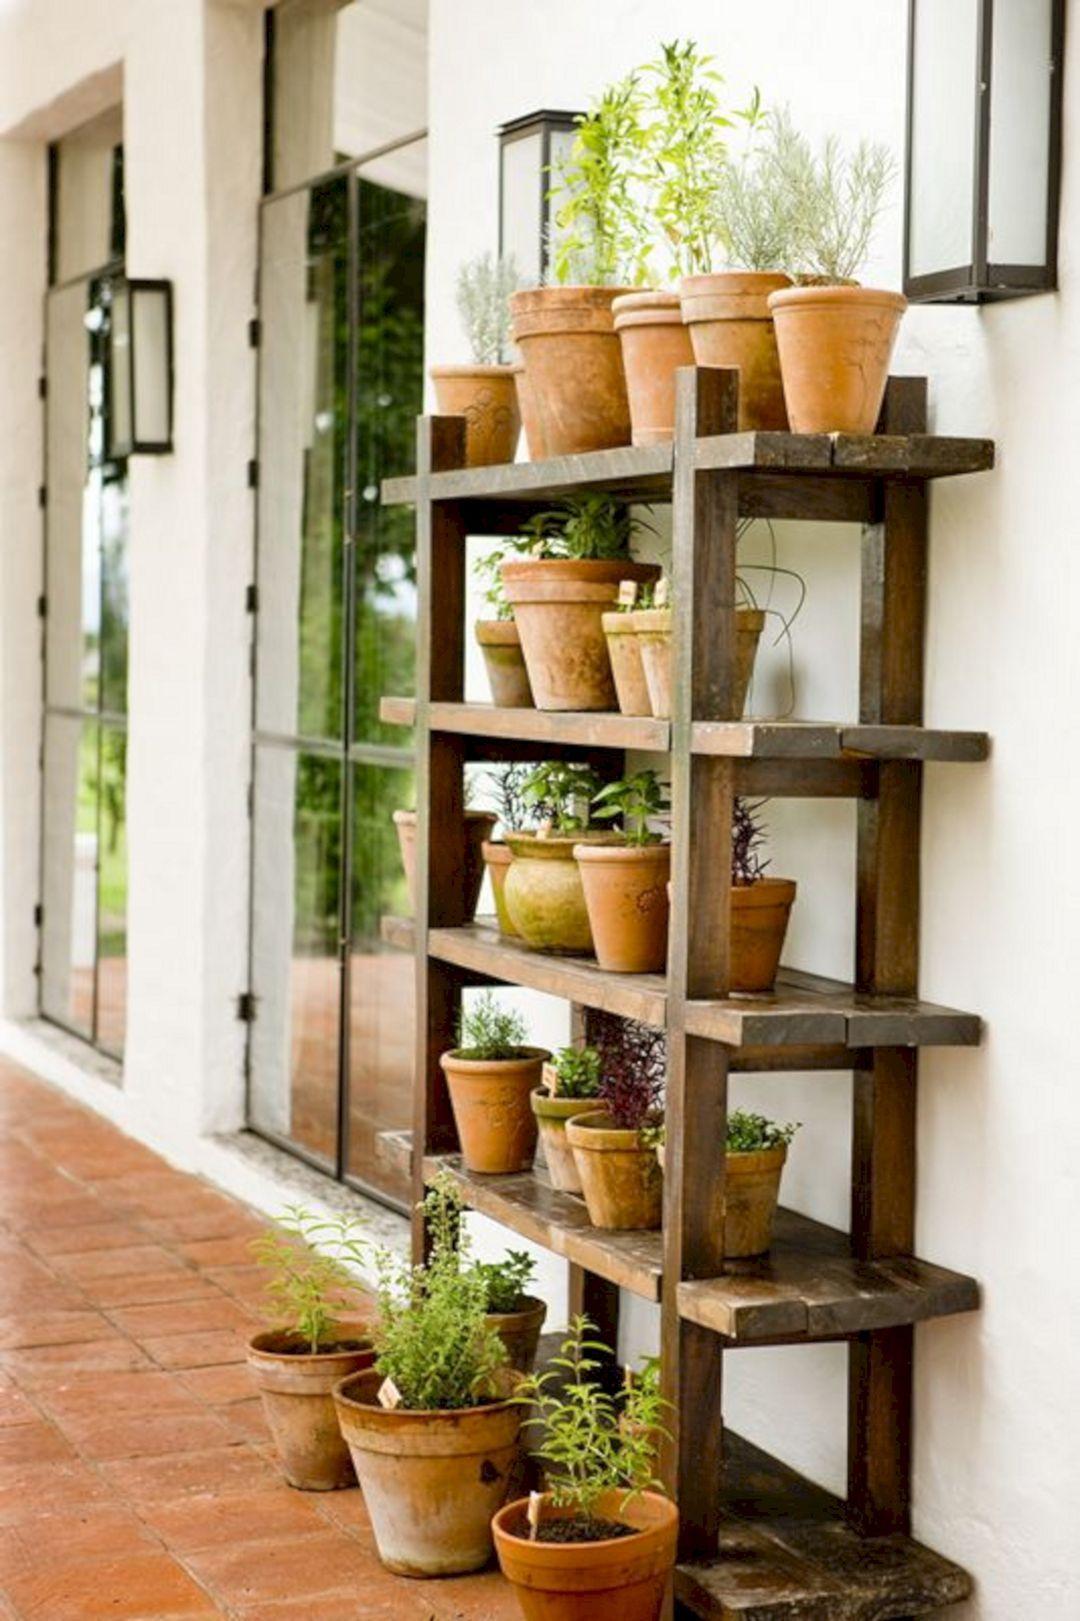 10 Fabulous Diy Plants Shelf Ideas For Wall Decoration Your Home